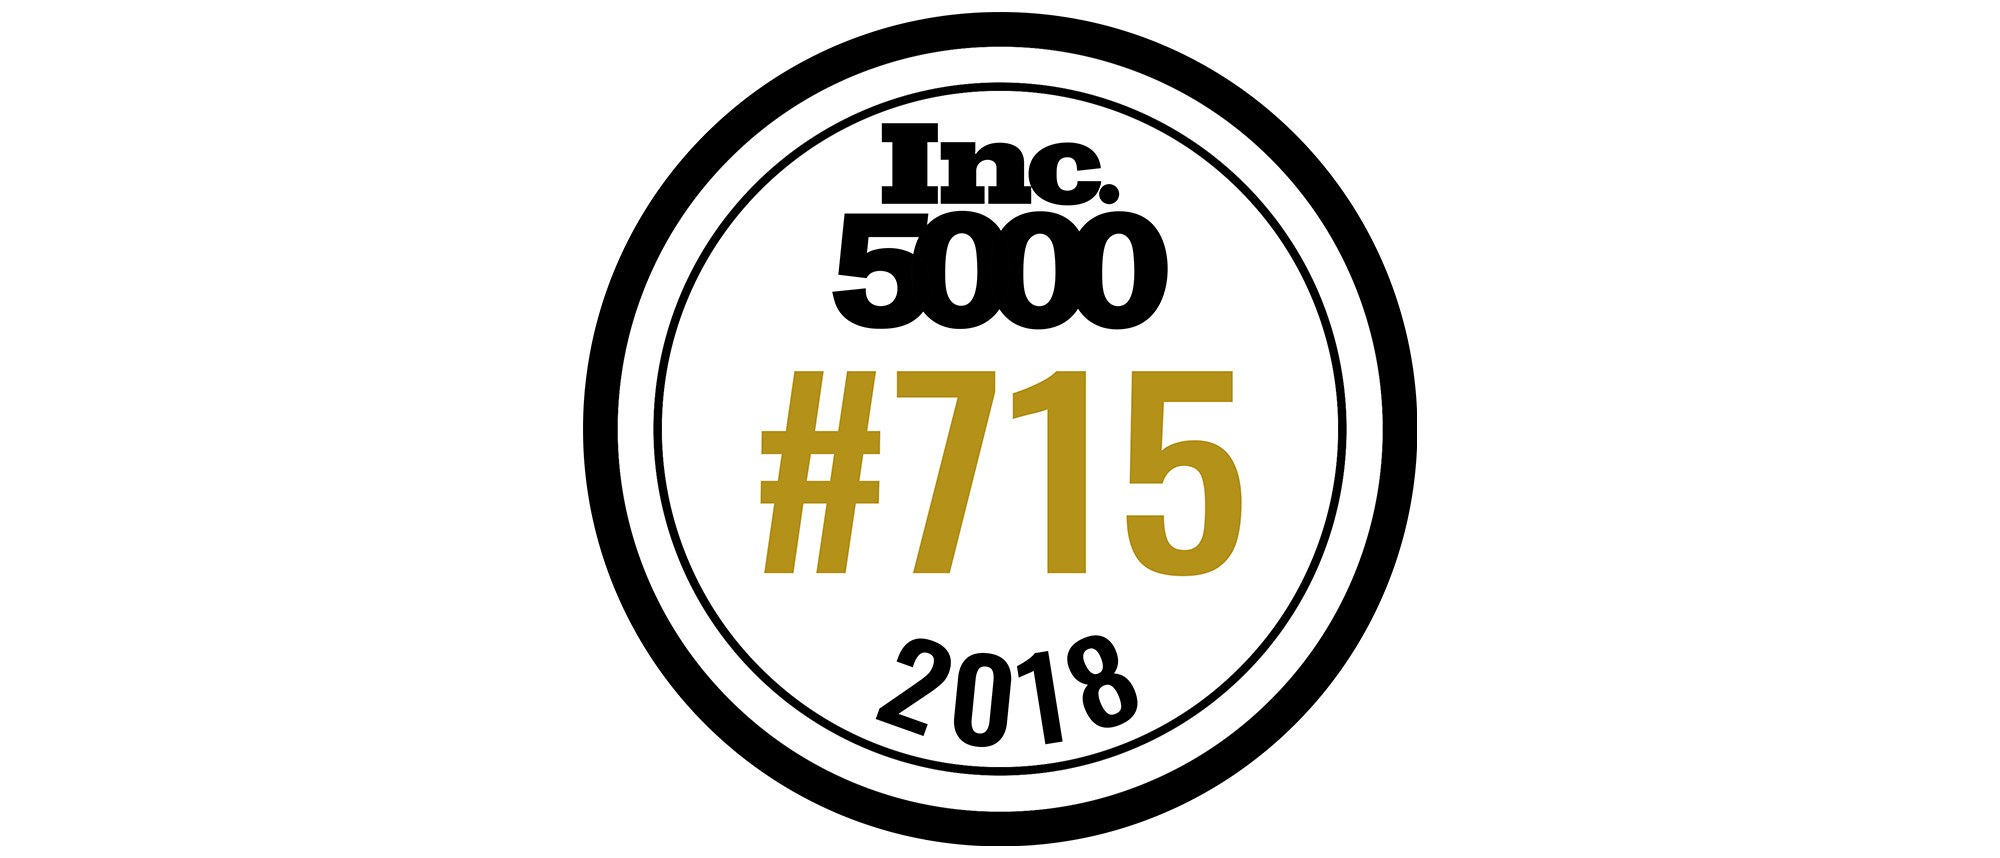 inc 5000 award n.715